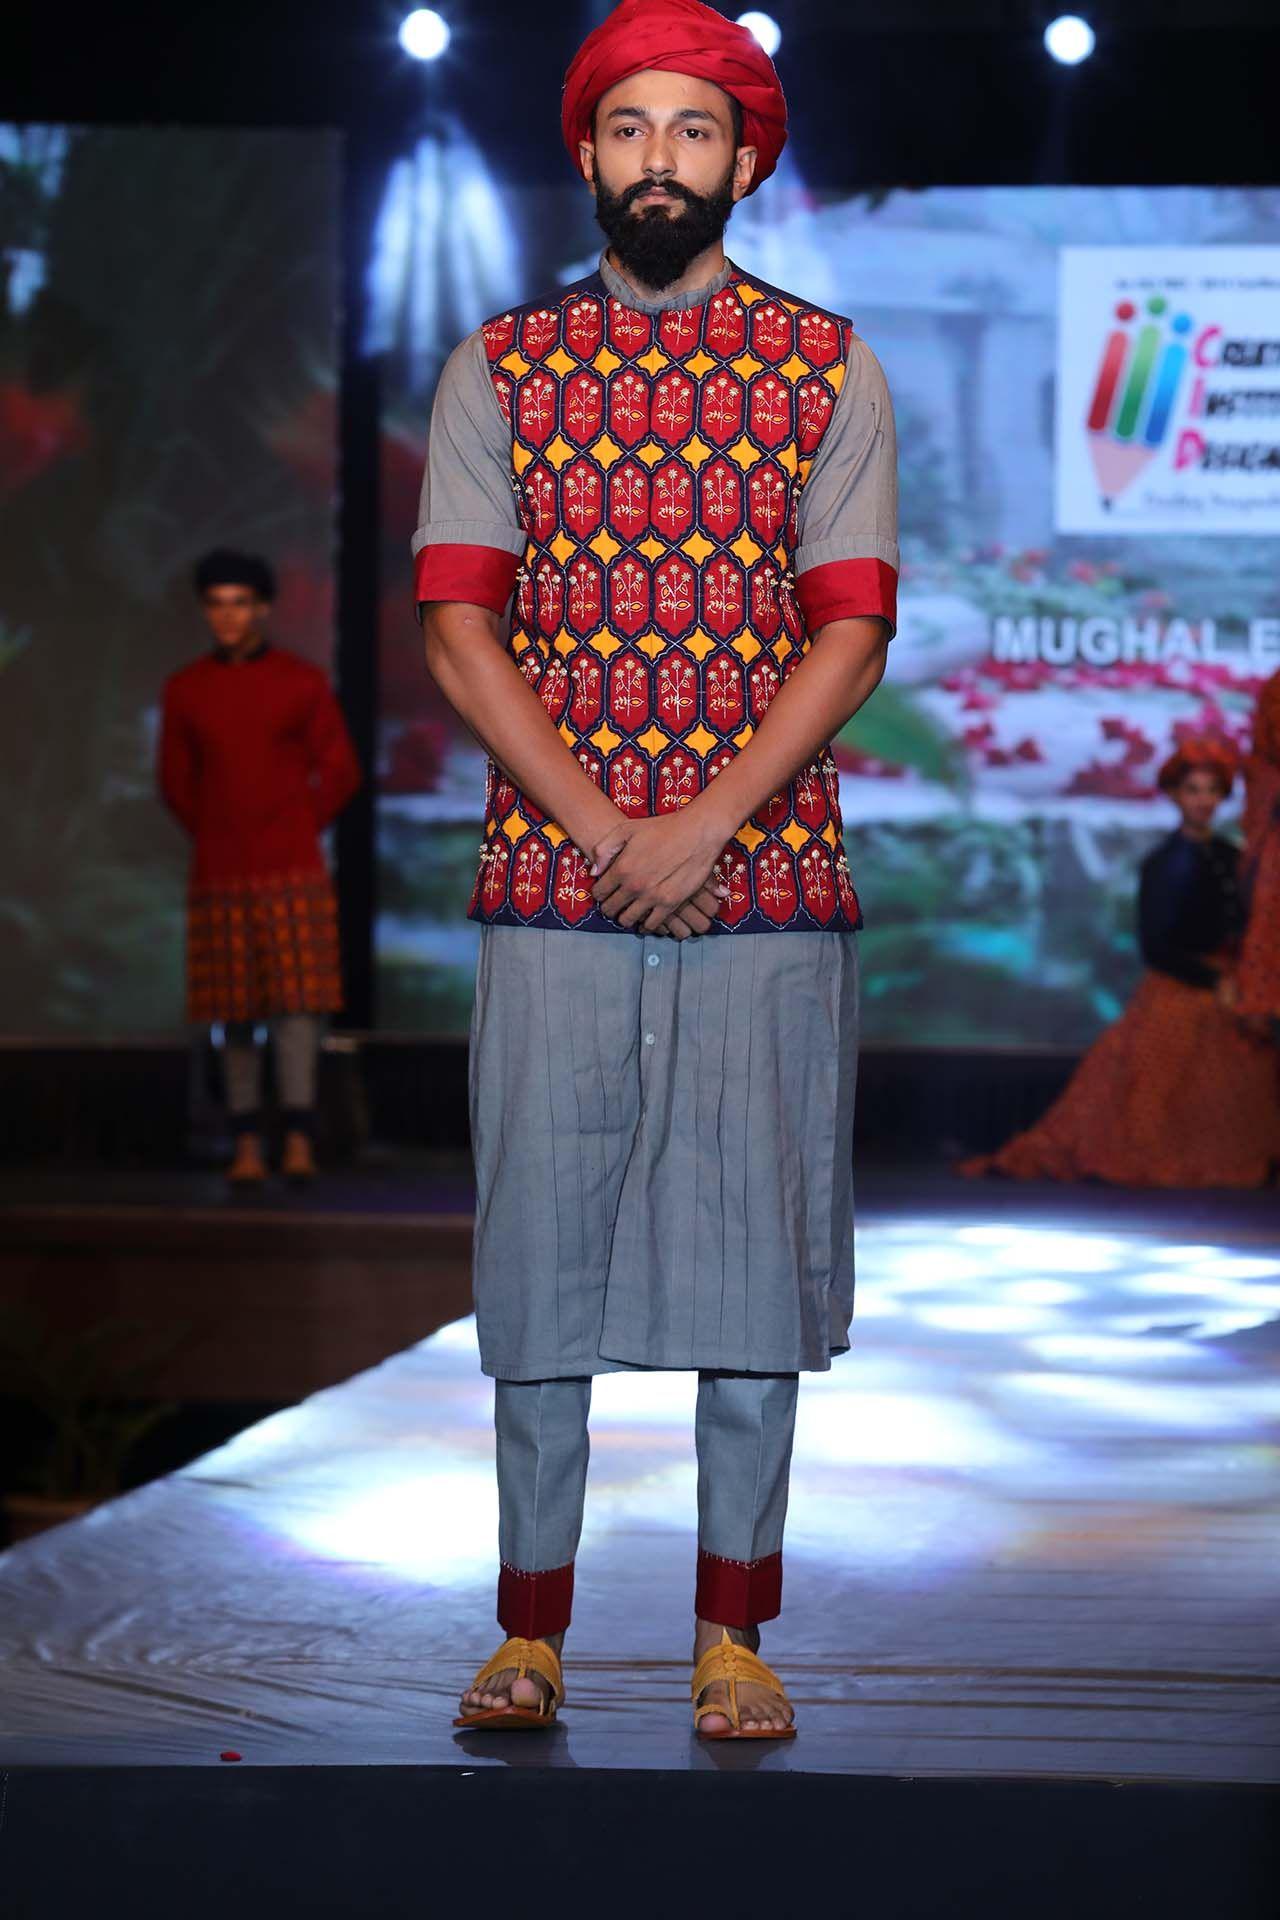 Creator Institute Of Designer Creative Fashion Eve 2o18 Theme Mughal Empire Students Divya Manshi Crea Fashion Fashion Show Themes Kids Fashion Show